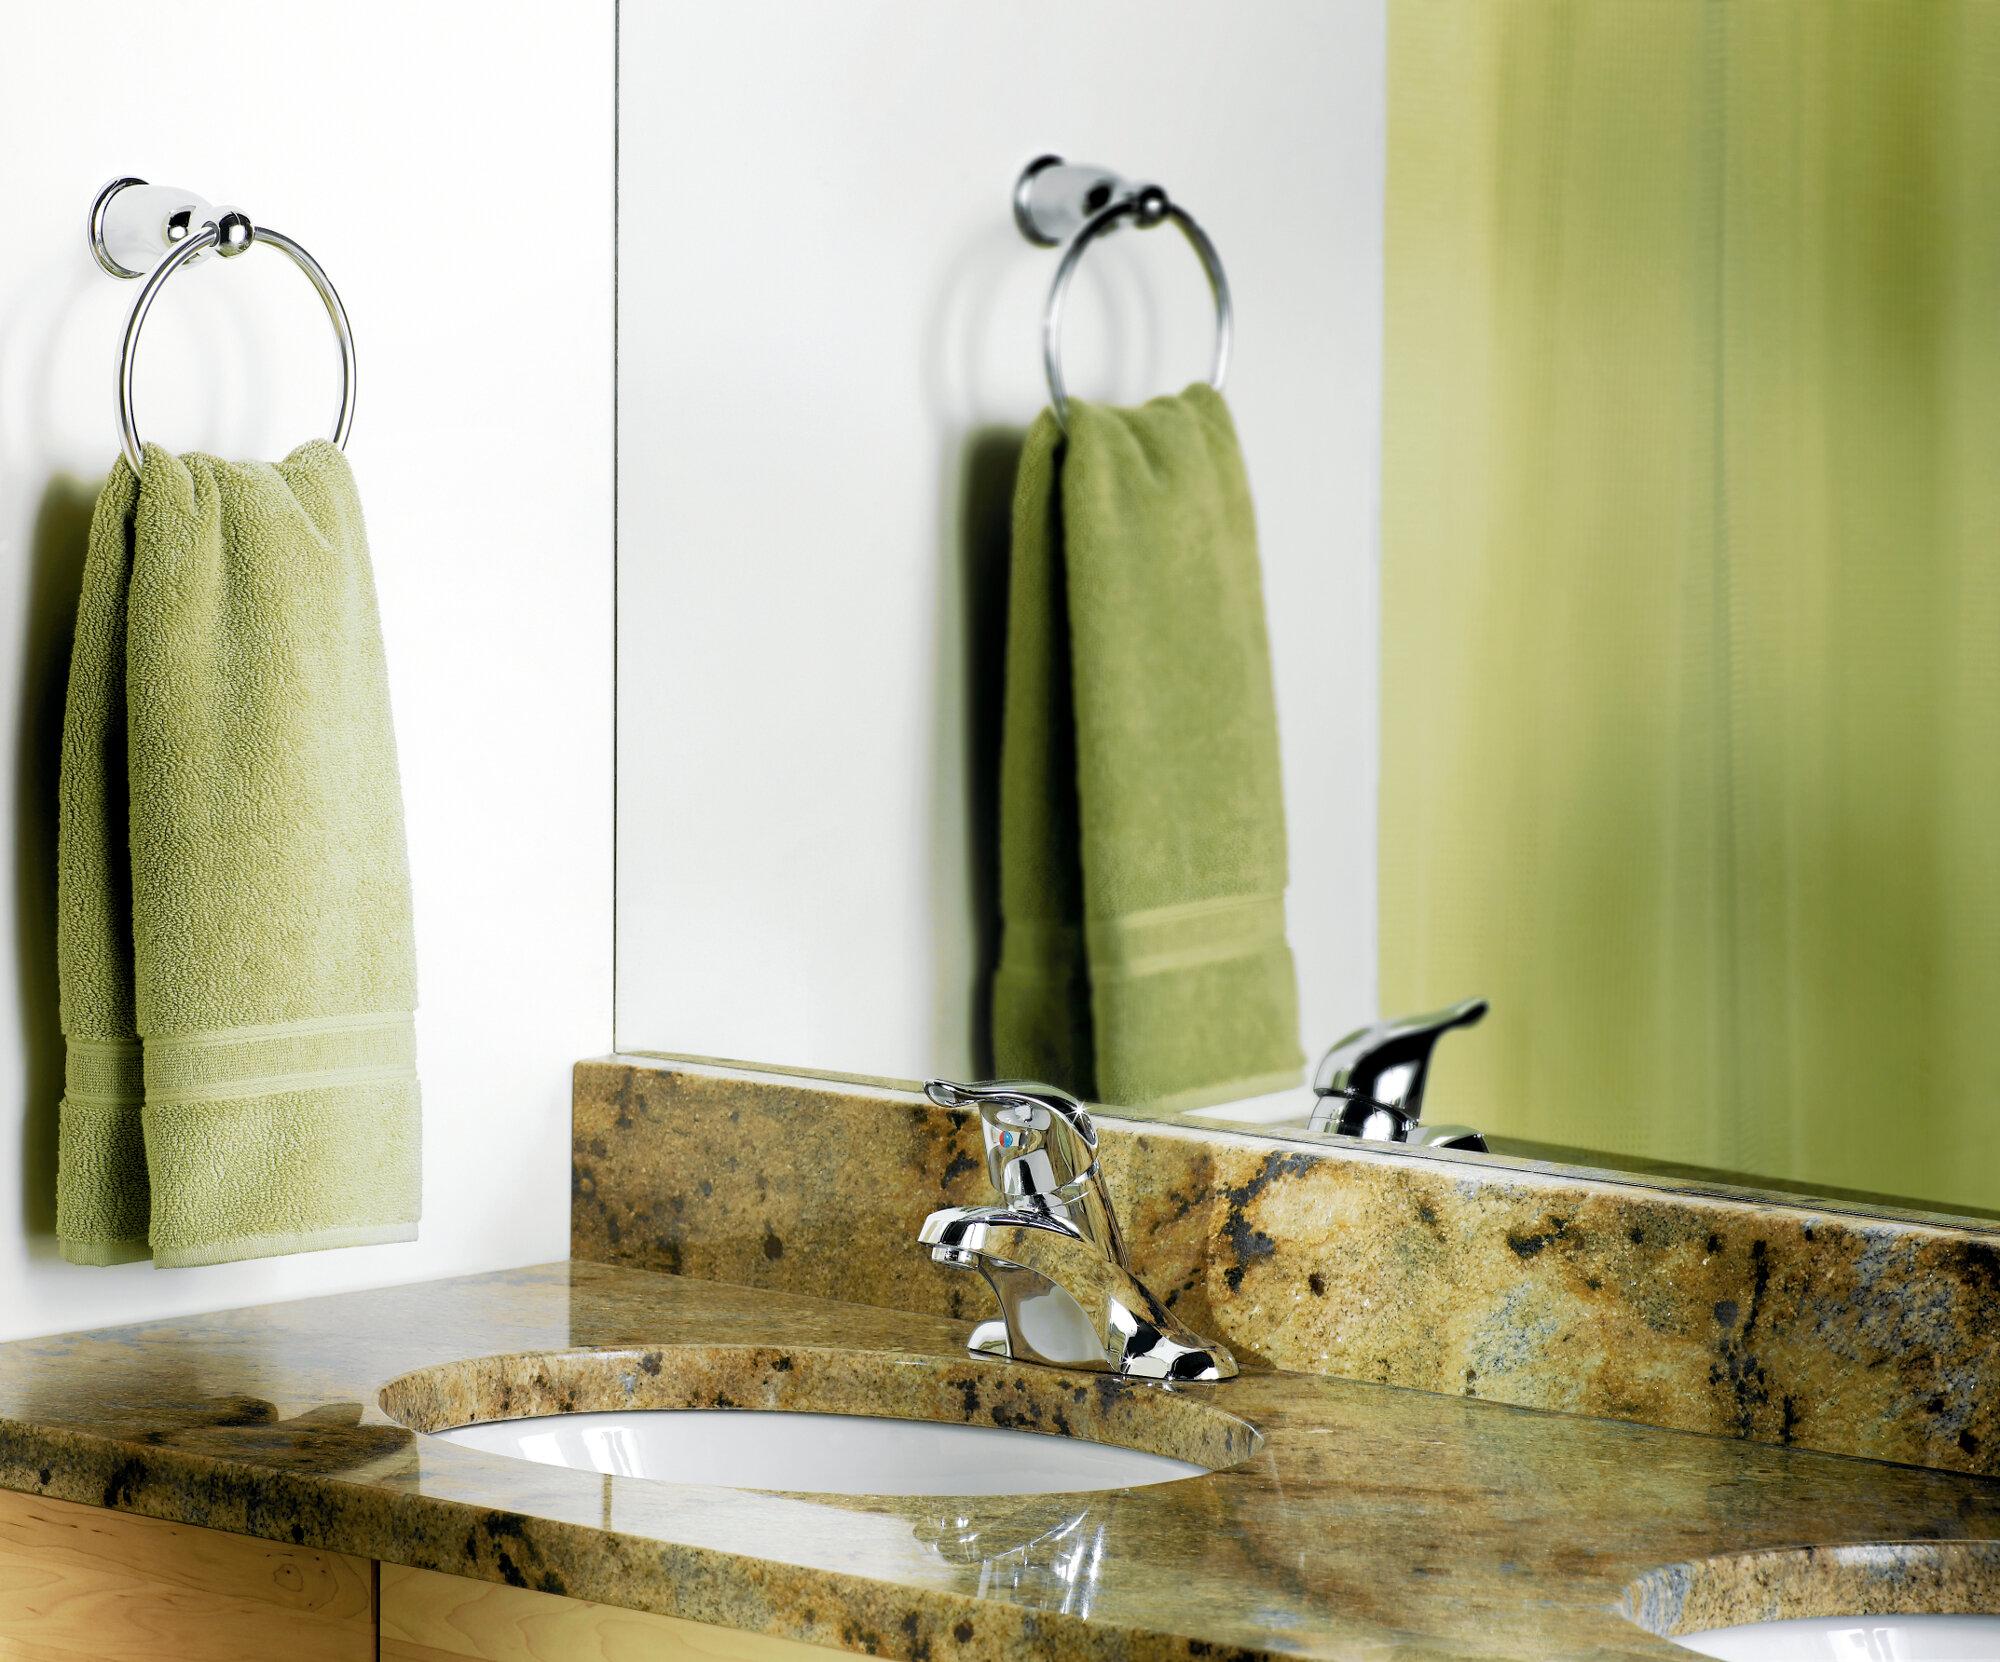 Yb8086ch Sn Owb Moen Mason Wall Mounted Towel Ring Reviews Wayfair